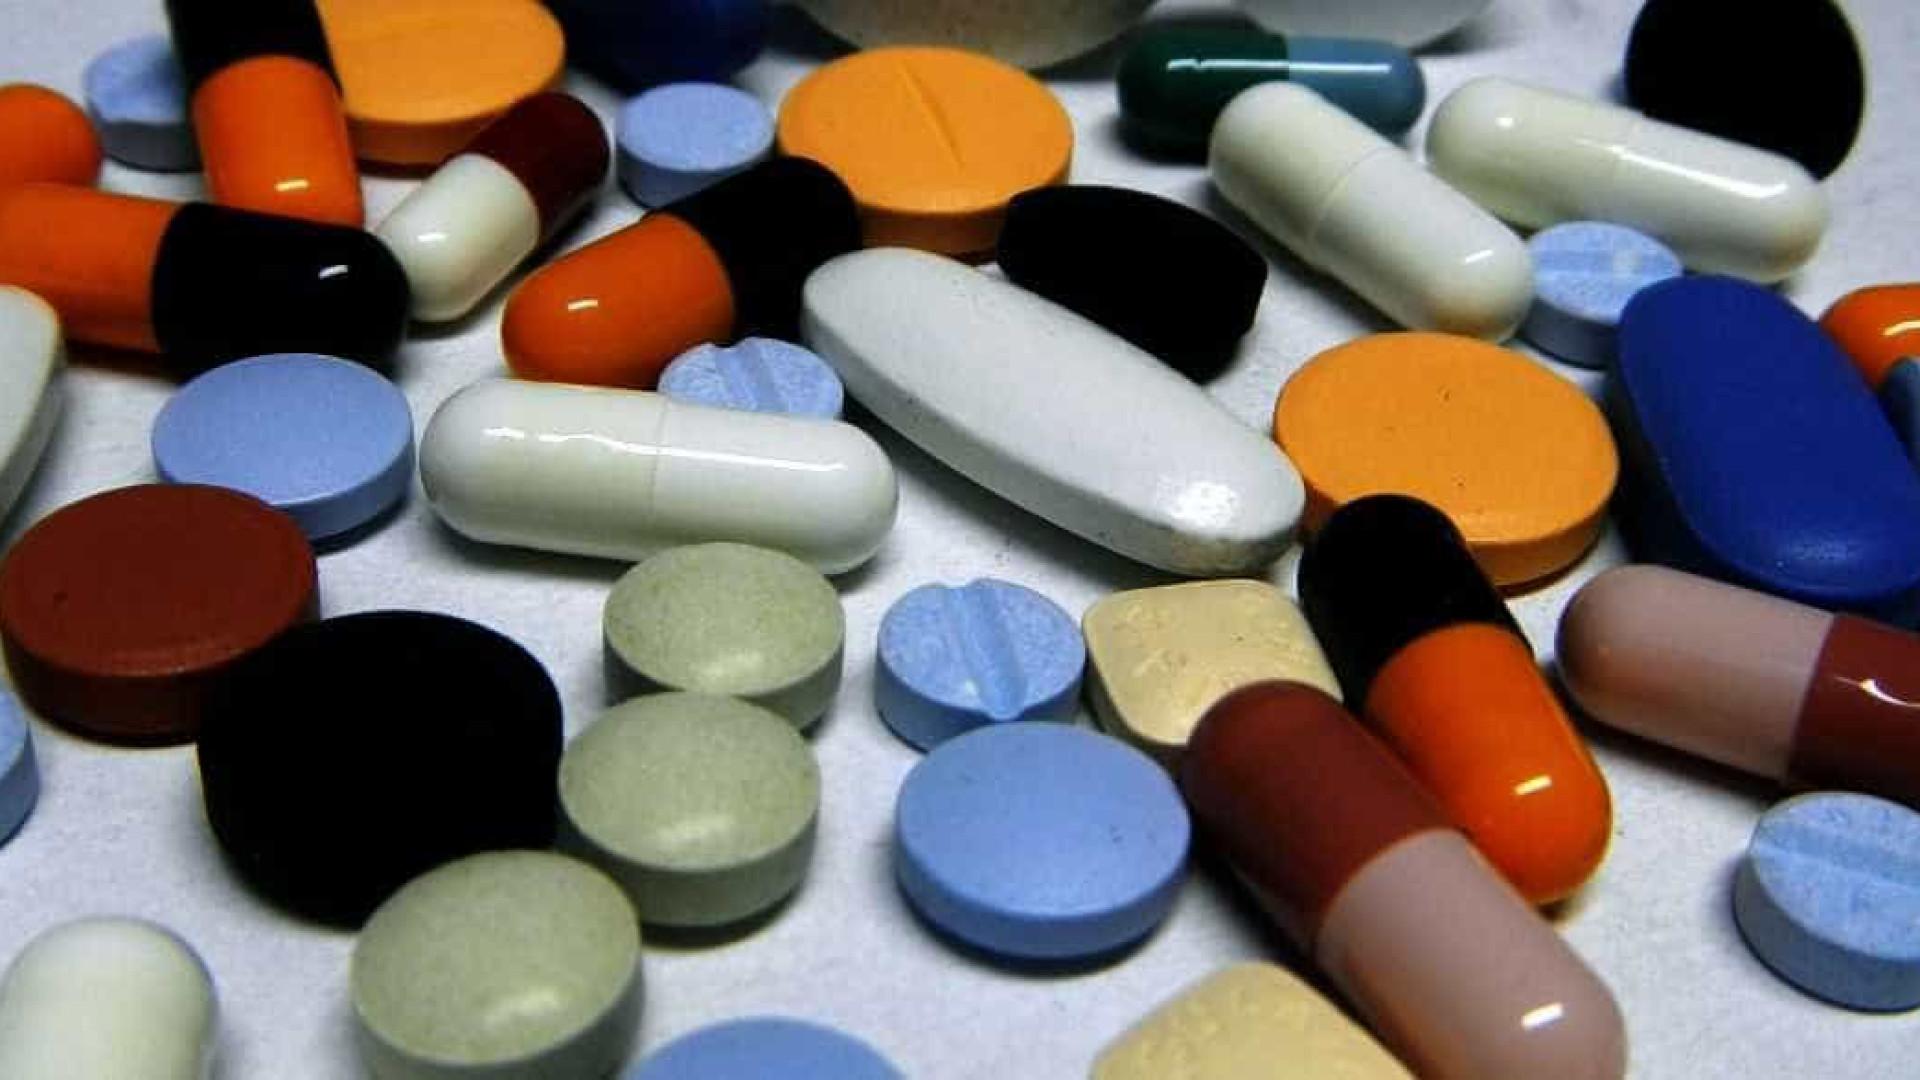 Anvisa suspende quatro antibióticos no Brasil